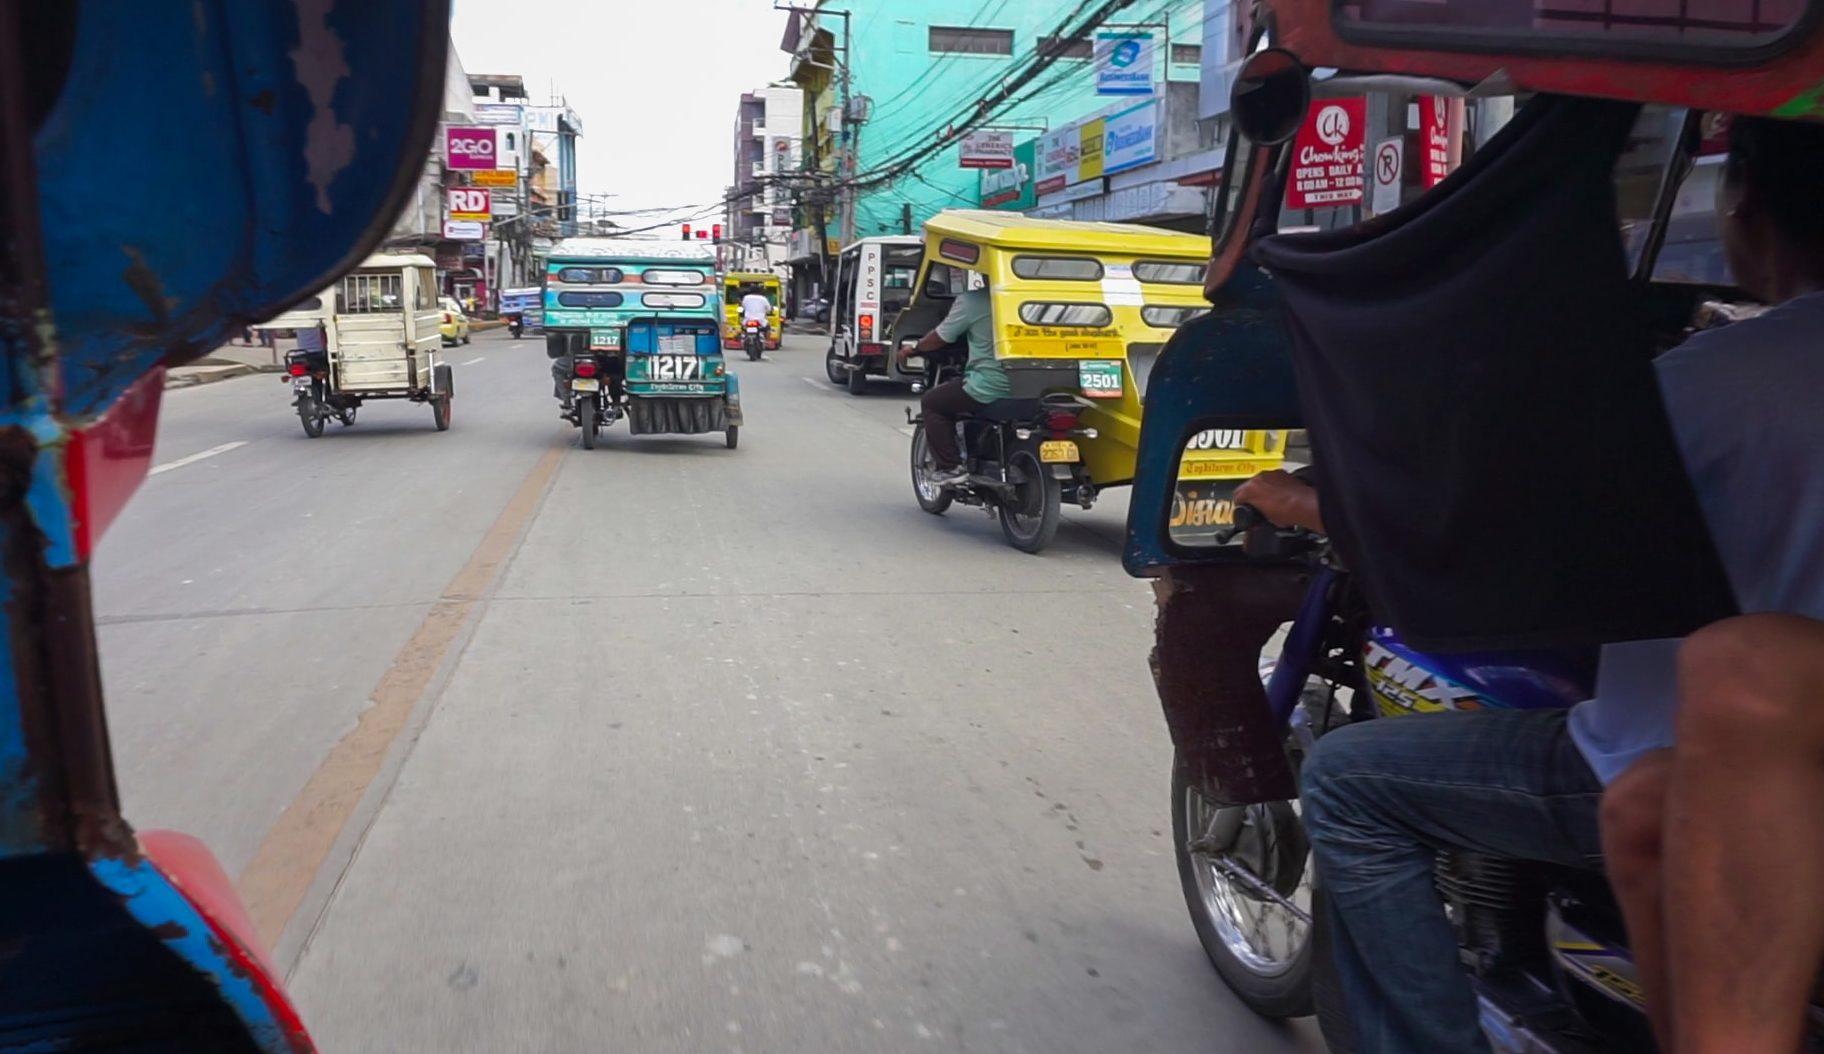 Philippinen Reisekosten